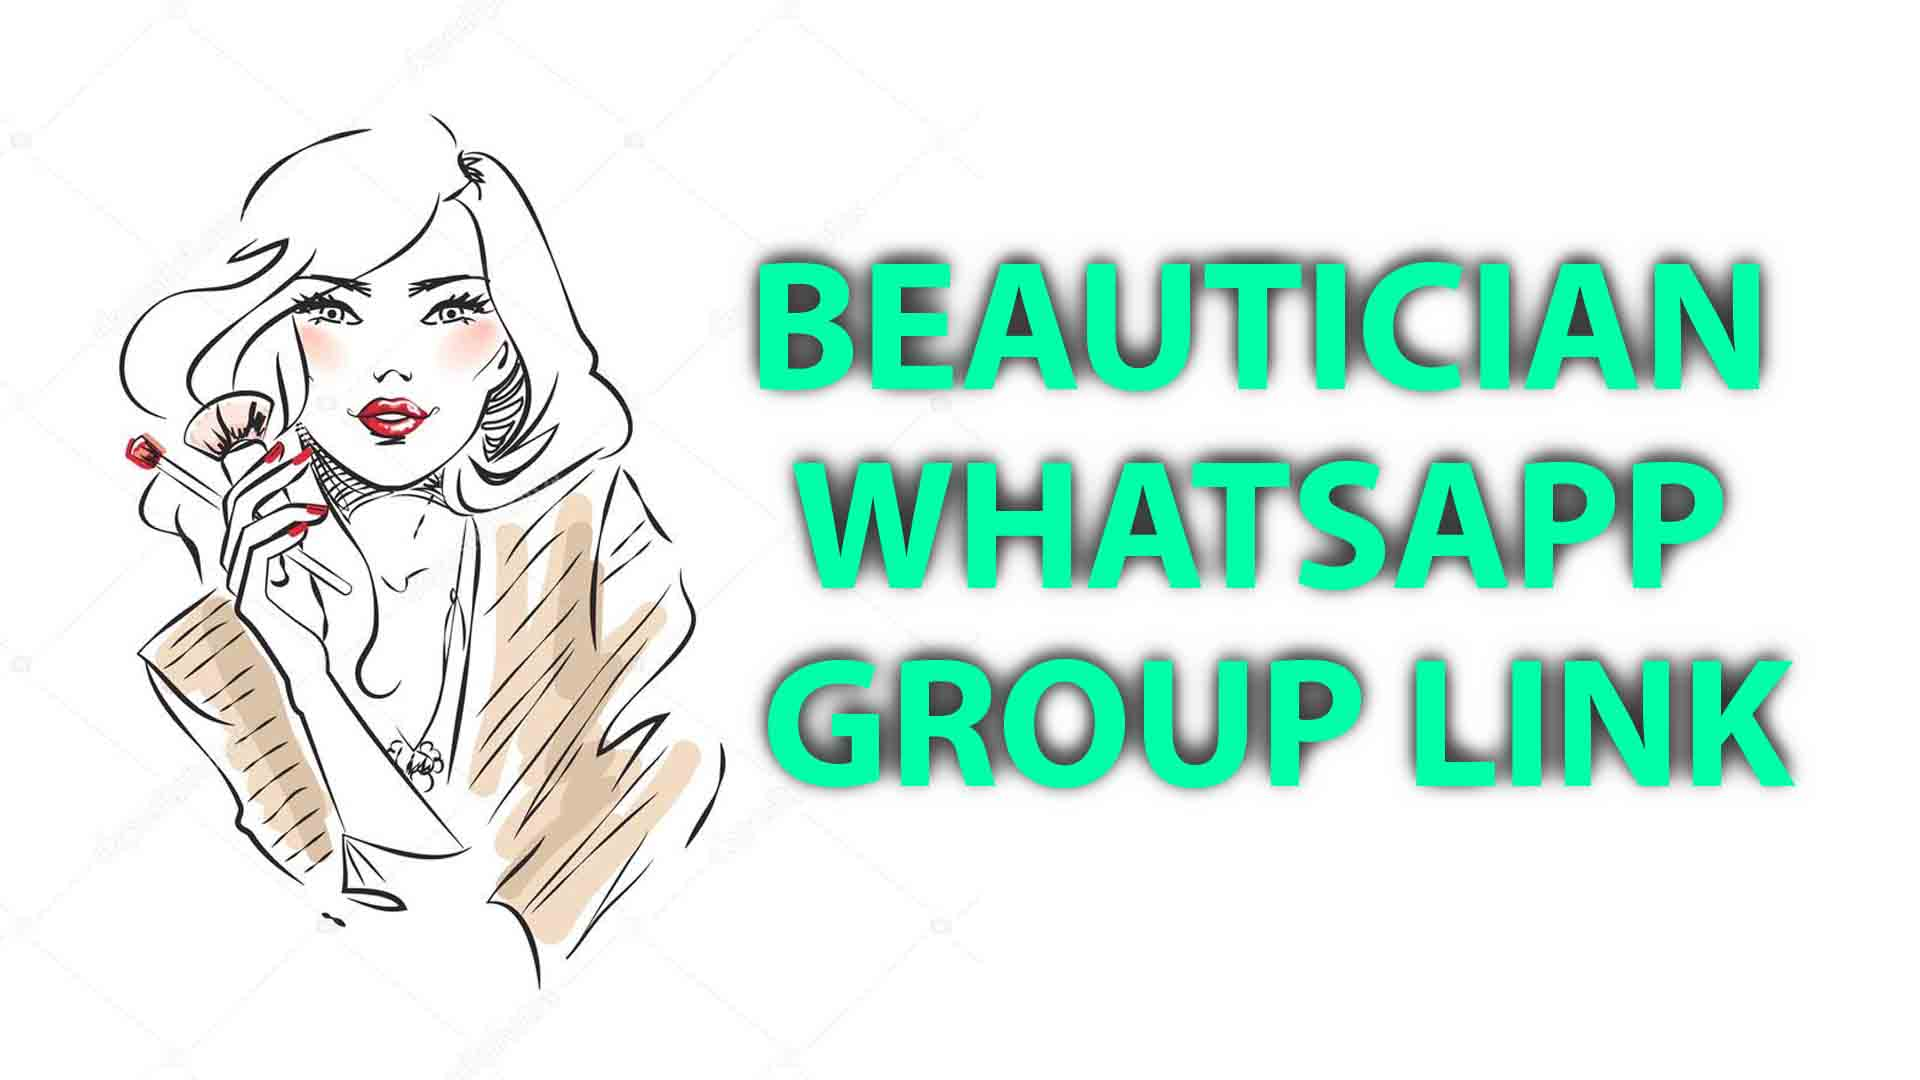 Beautician WhatsApp group link